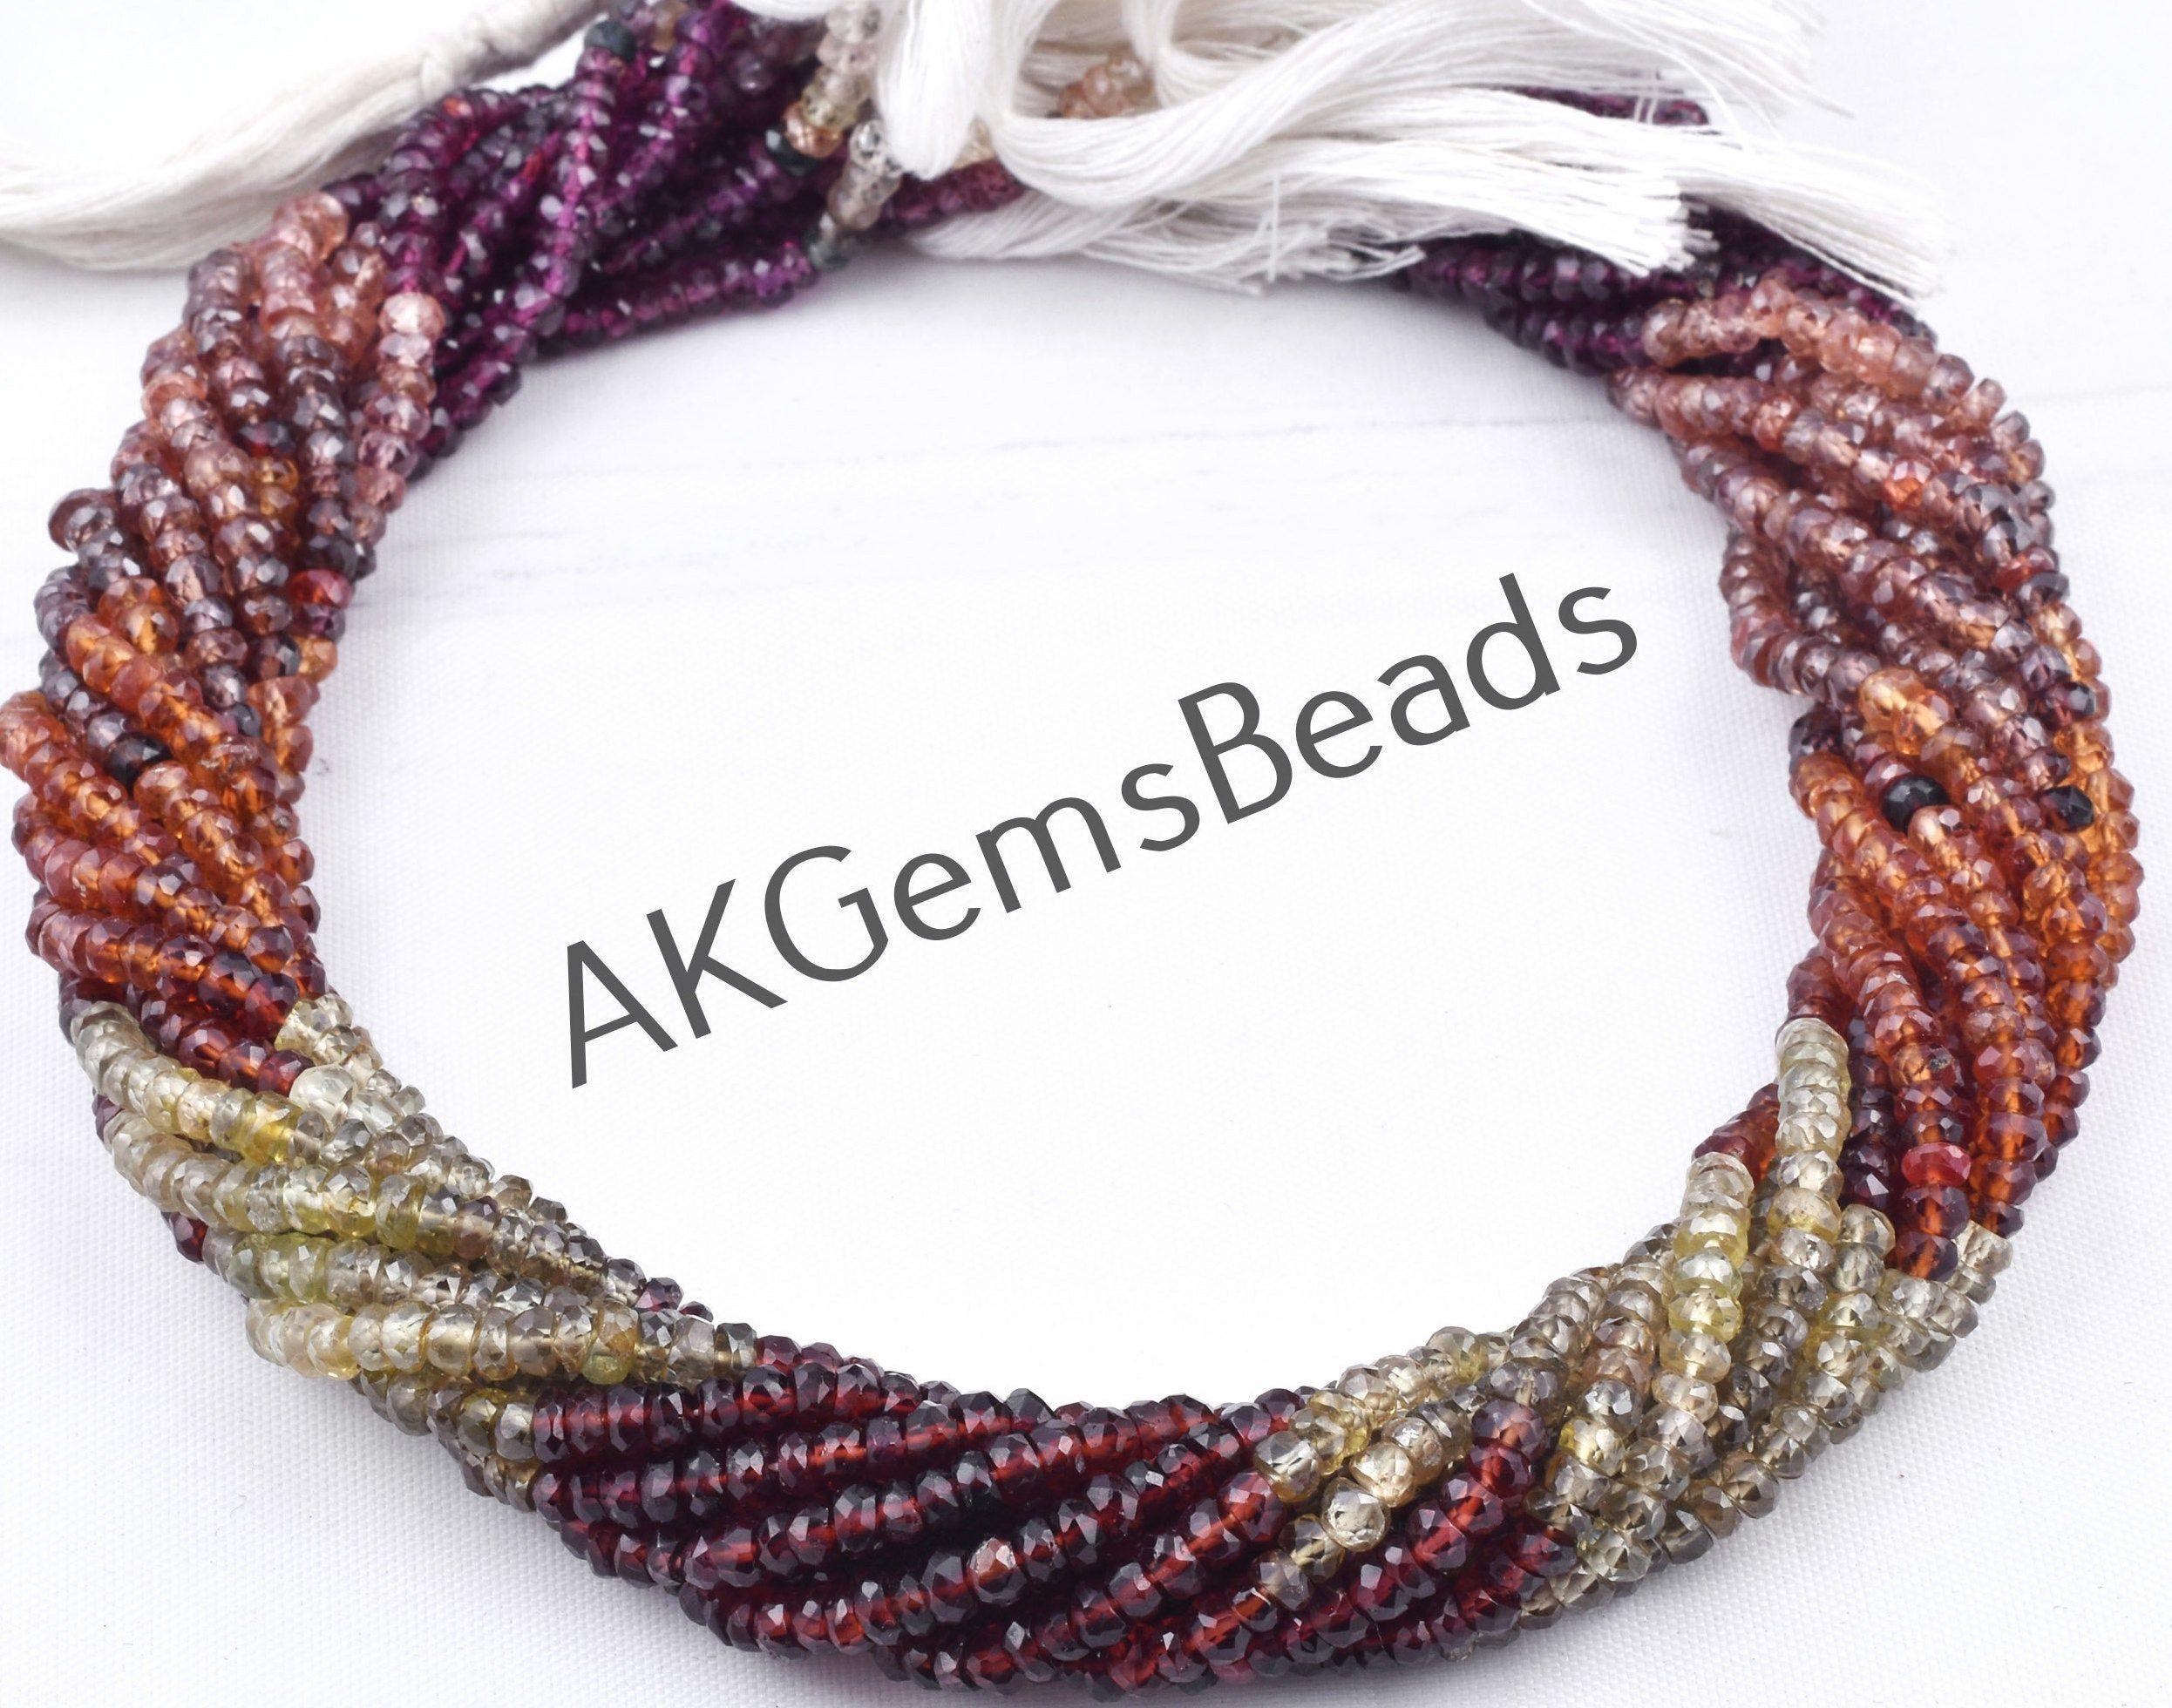 Loose Bead 13 Inch Strand Stone Bead AAA+ Quality Natural Bead Garnet Beads Strand Rondelle Bead 2-4 mm Bead Gemstone Bead